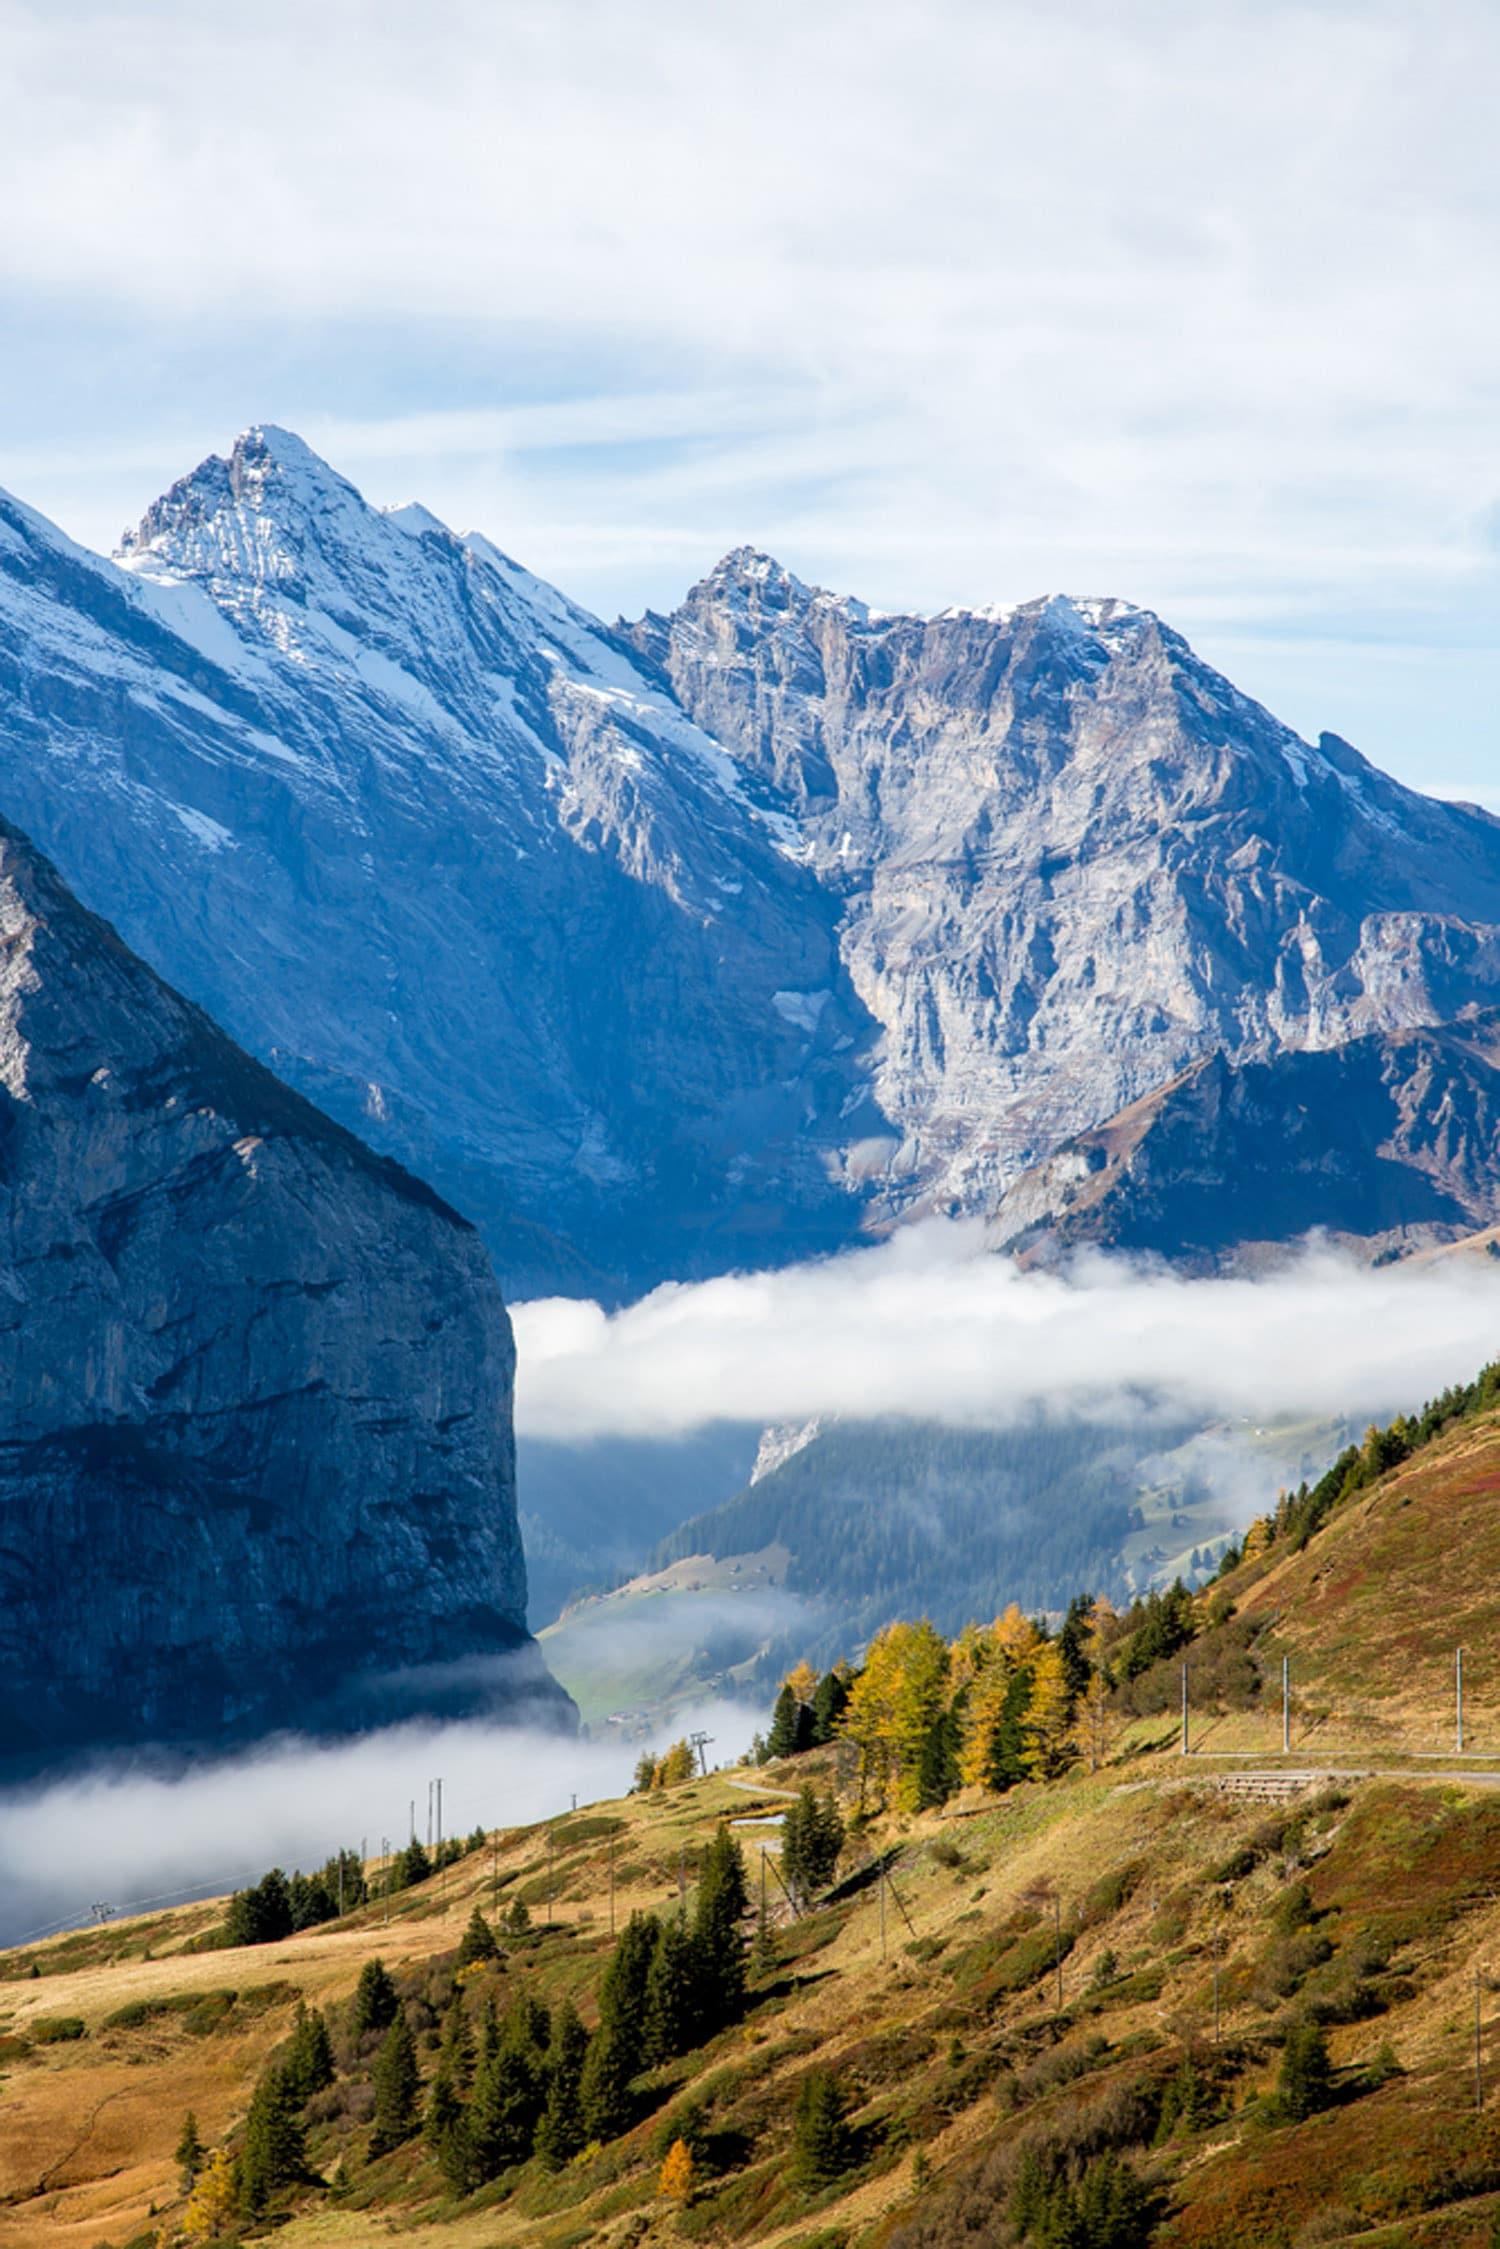 Trip to jungfrau